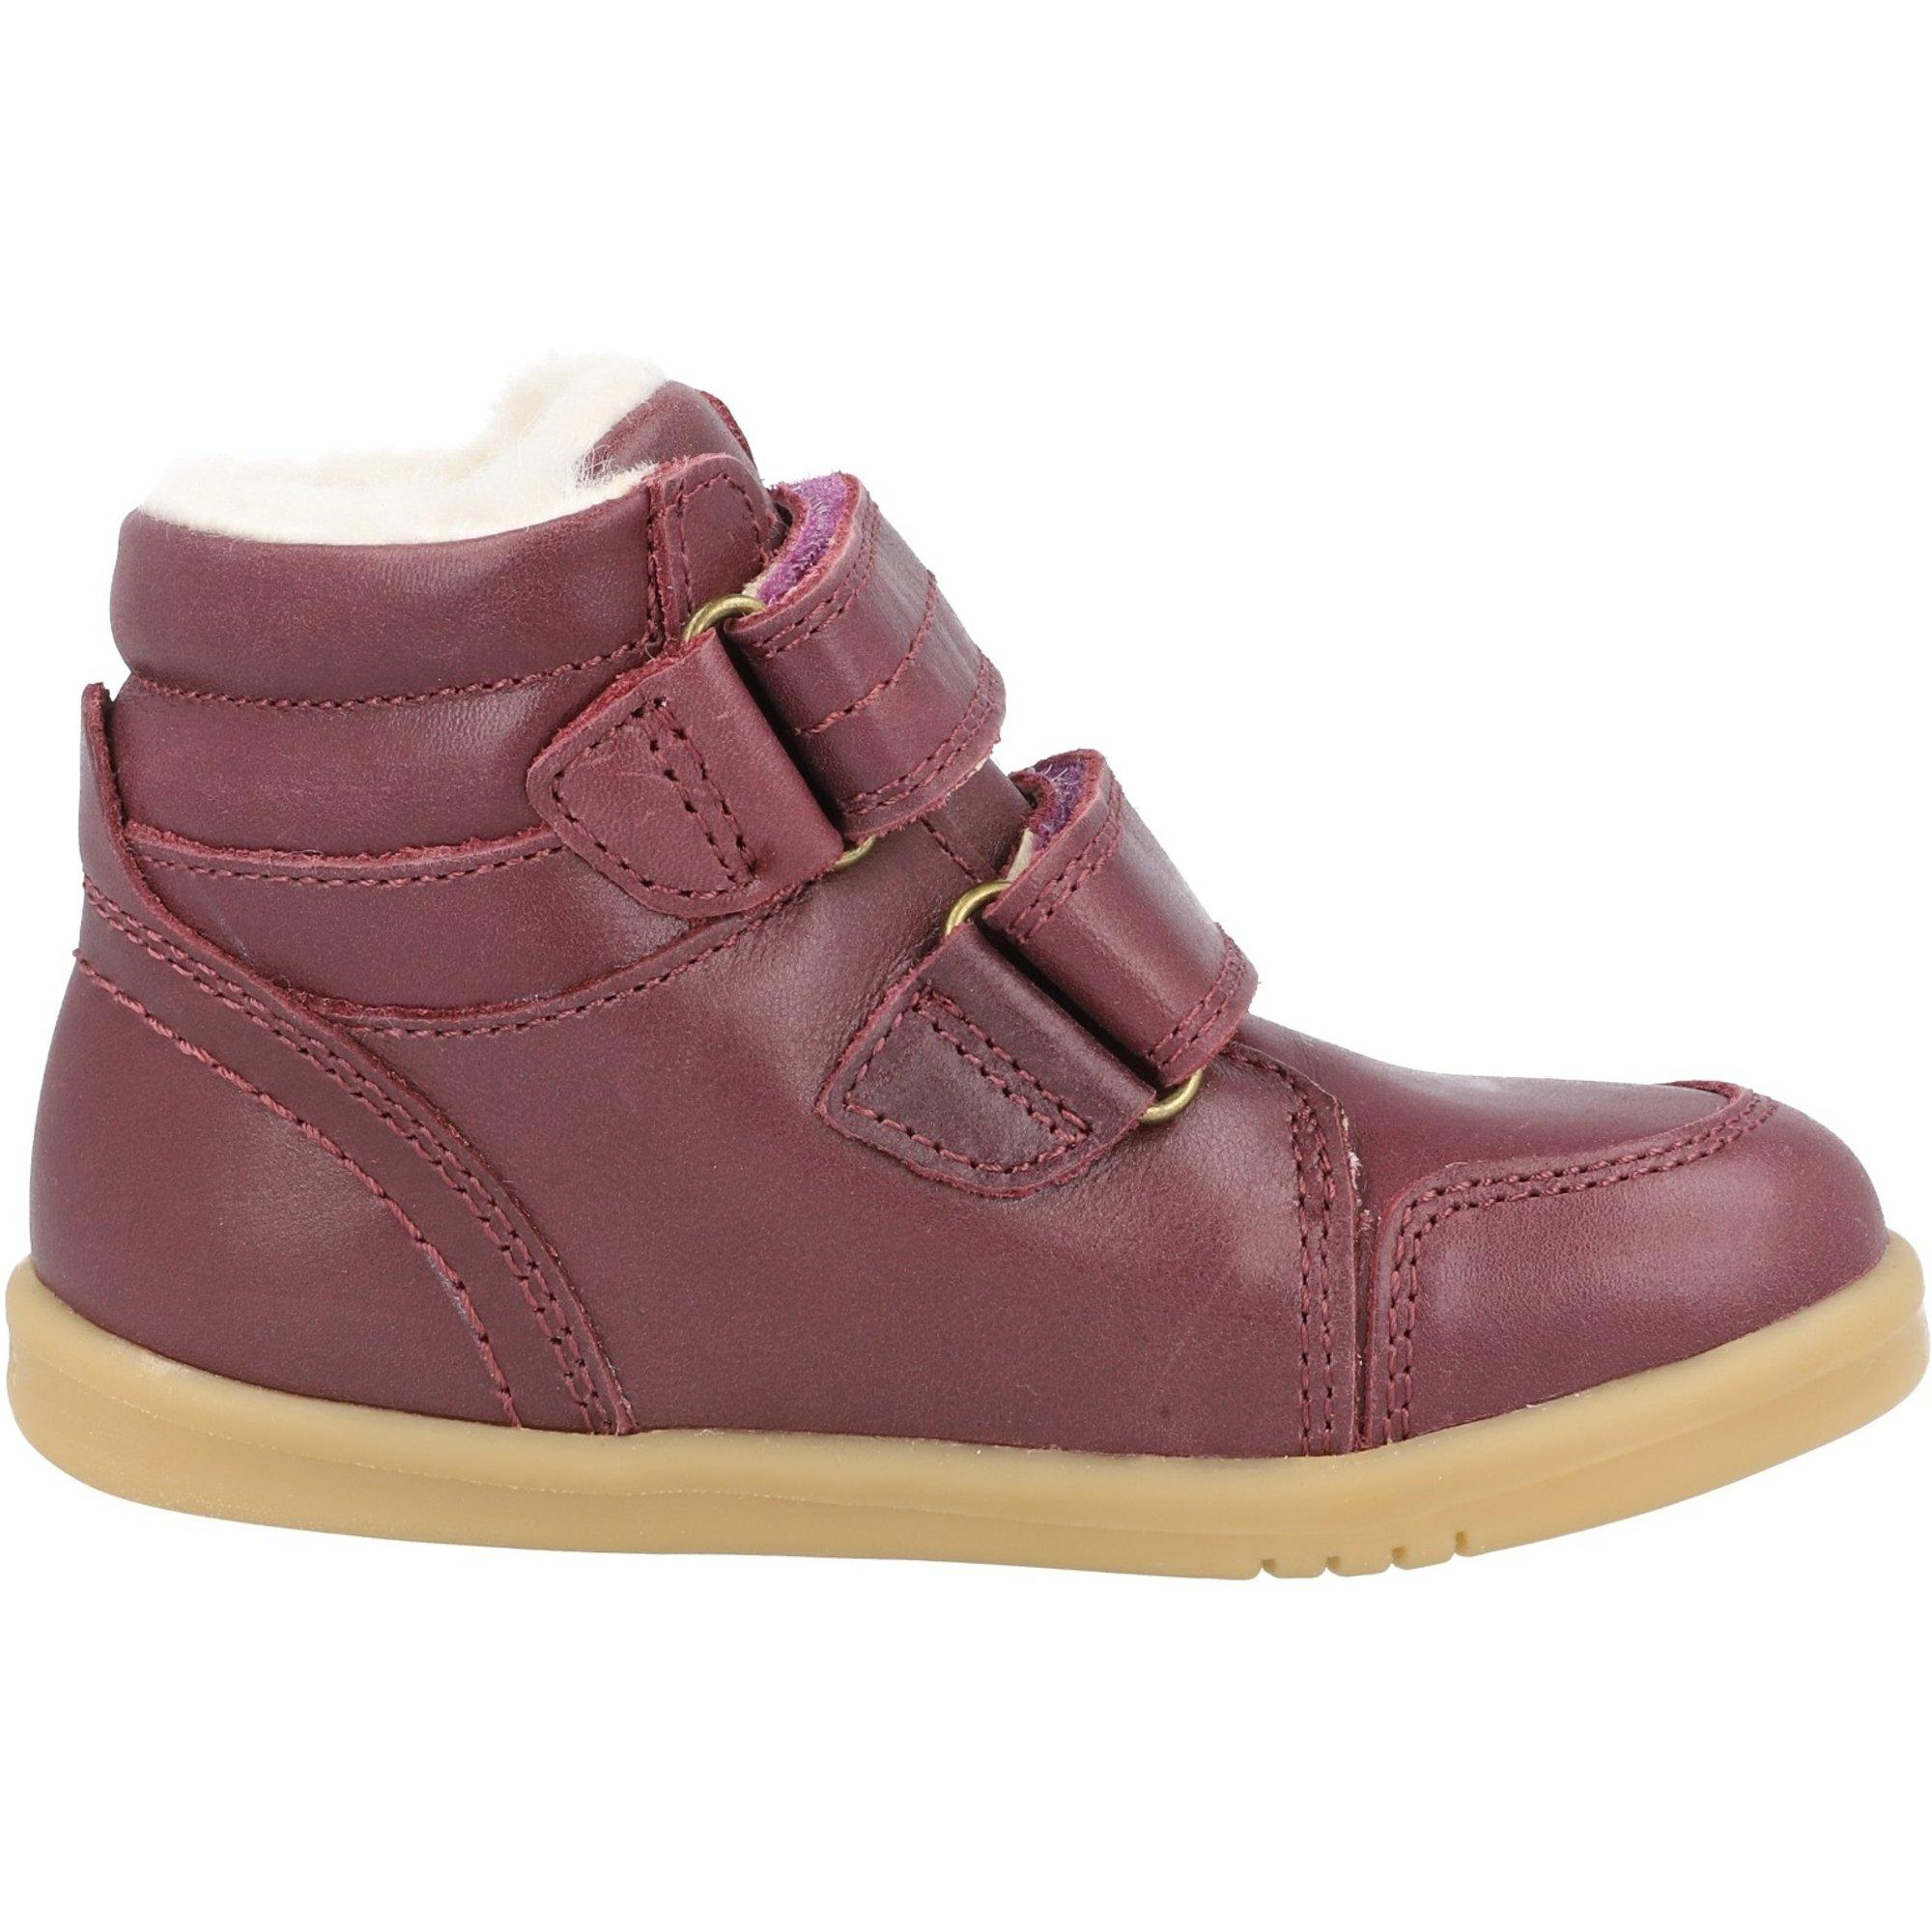 Bobux i-Walk Timber Arctic Plum Quickdry Vintage-Look Leather